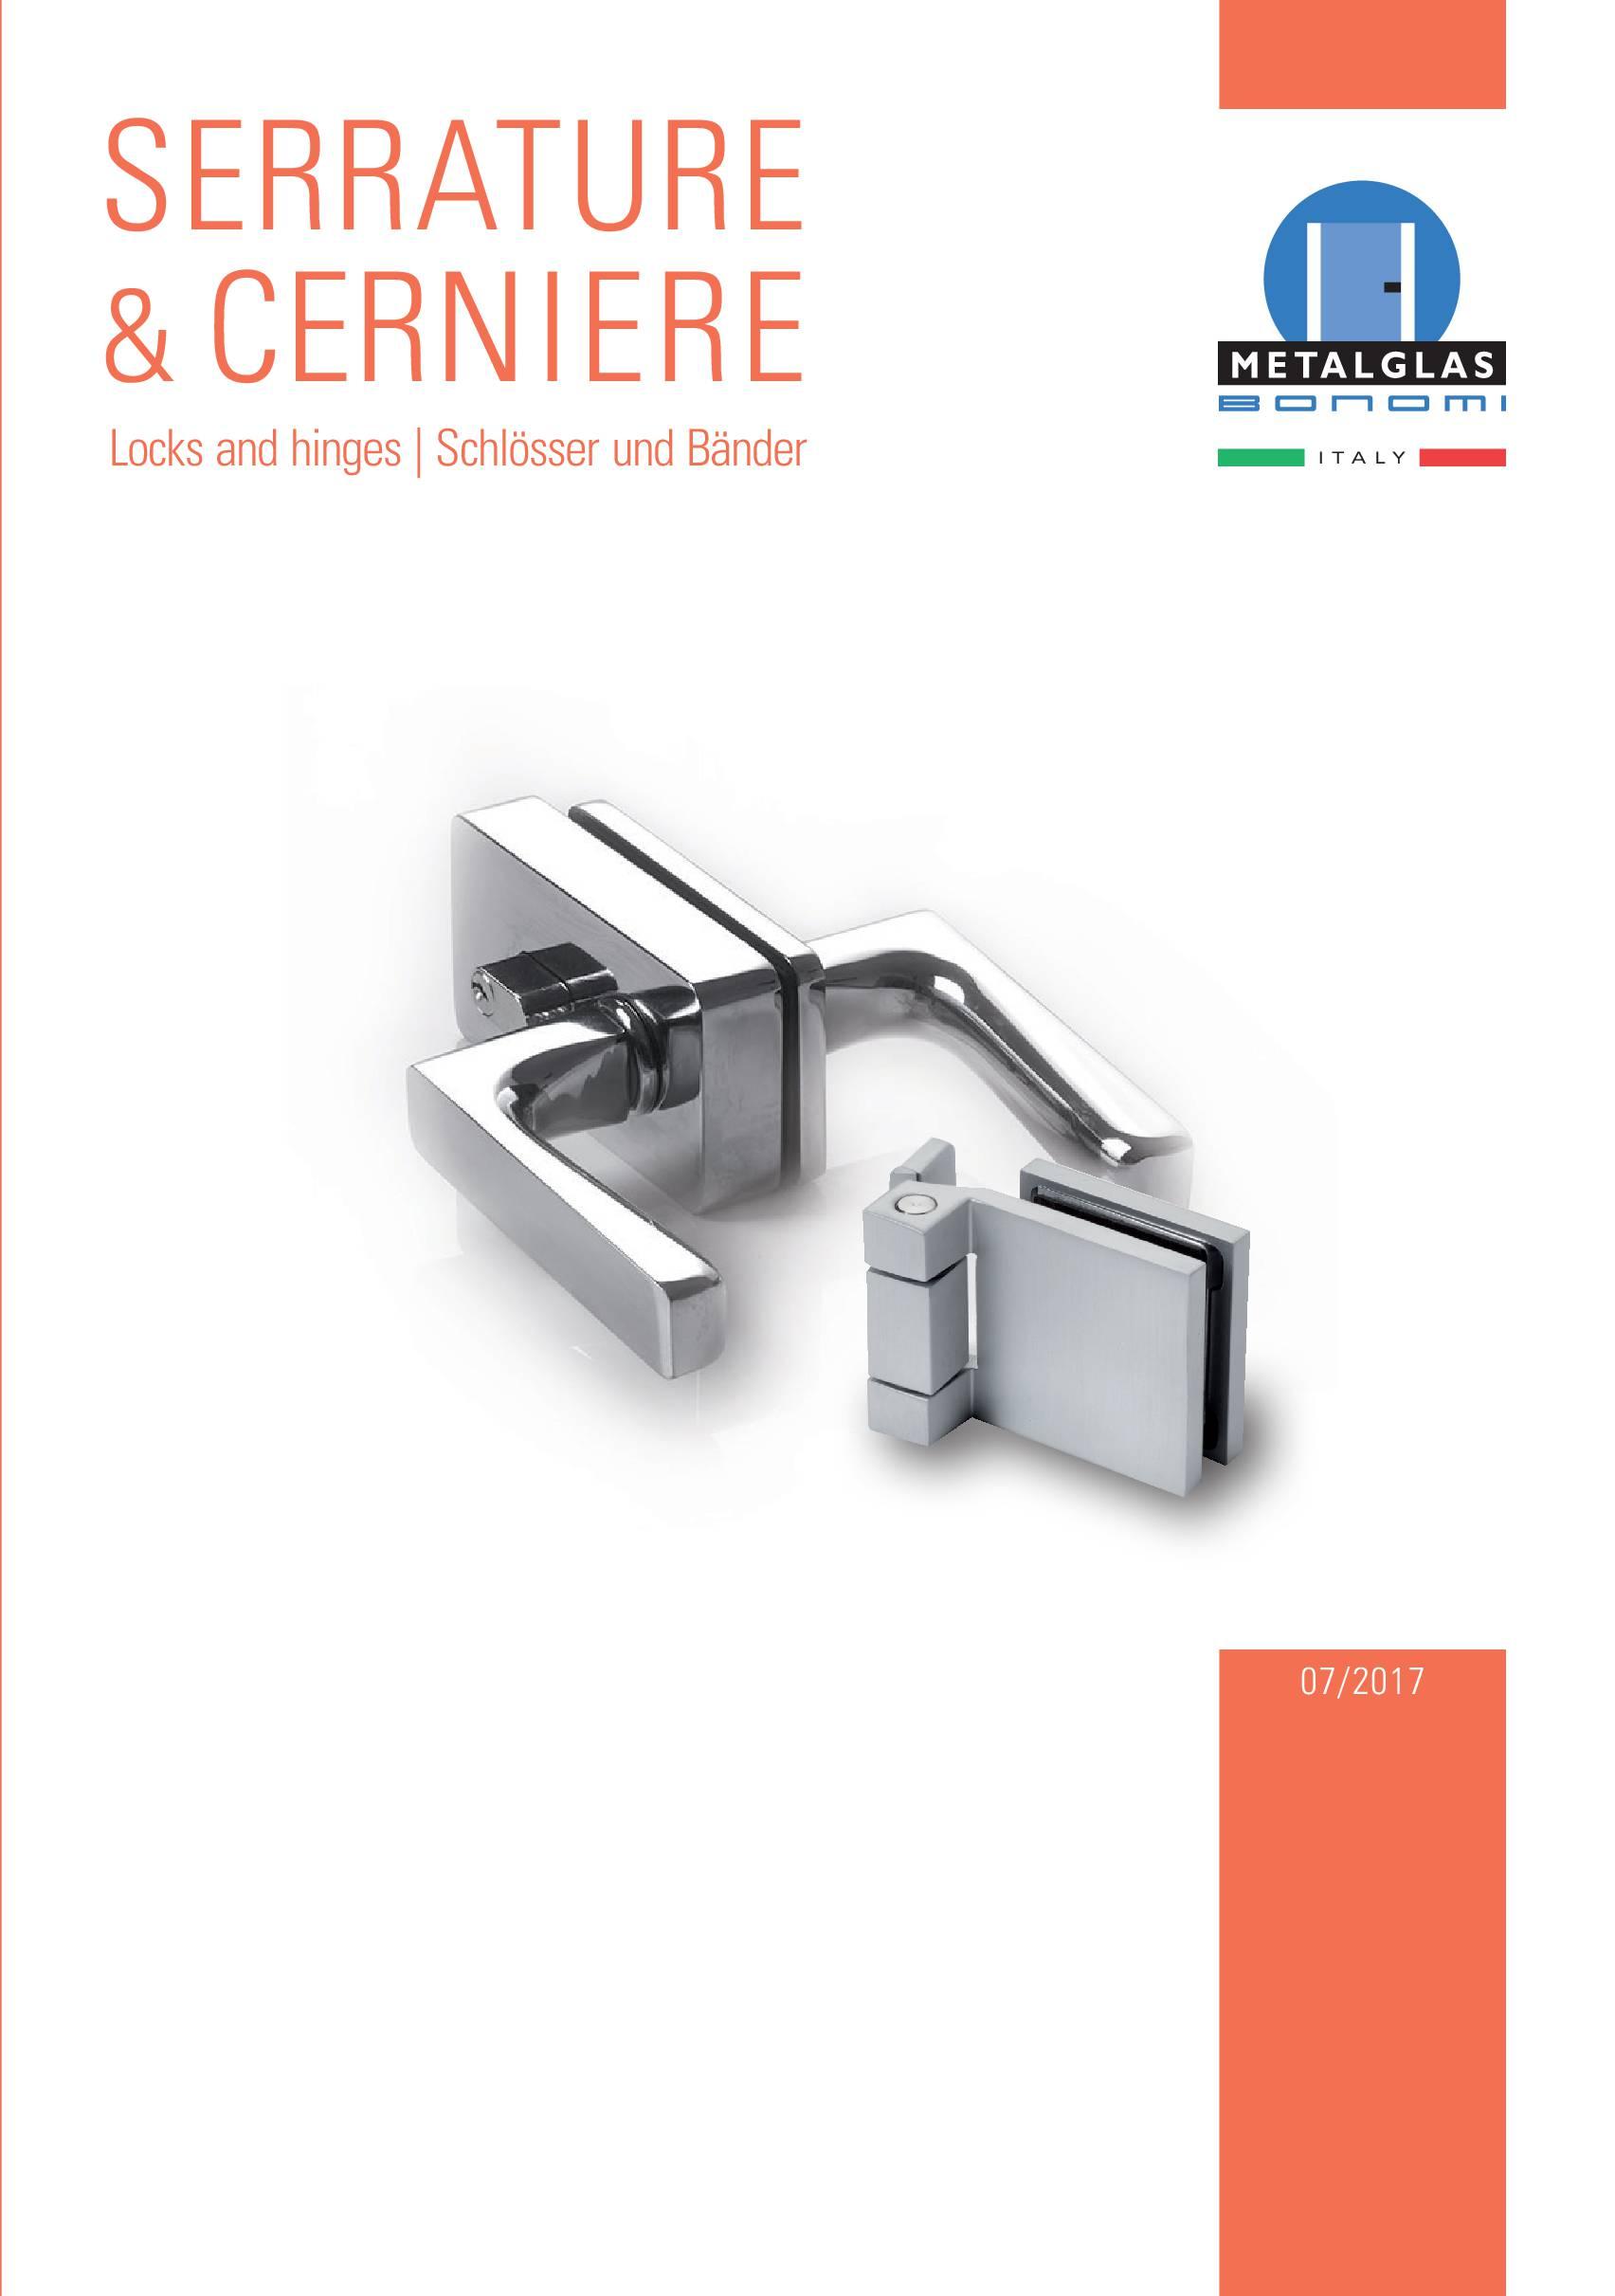 Metalglas – Serrature e Cerniere